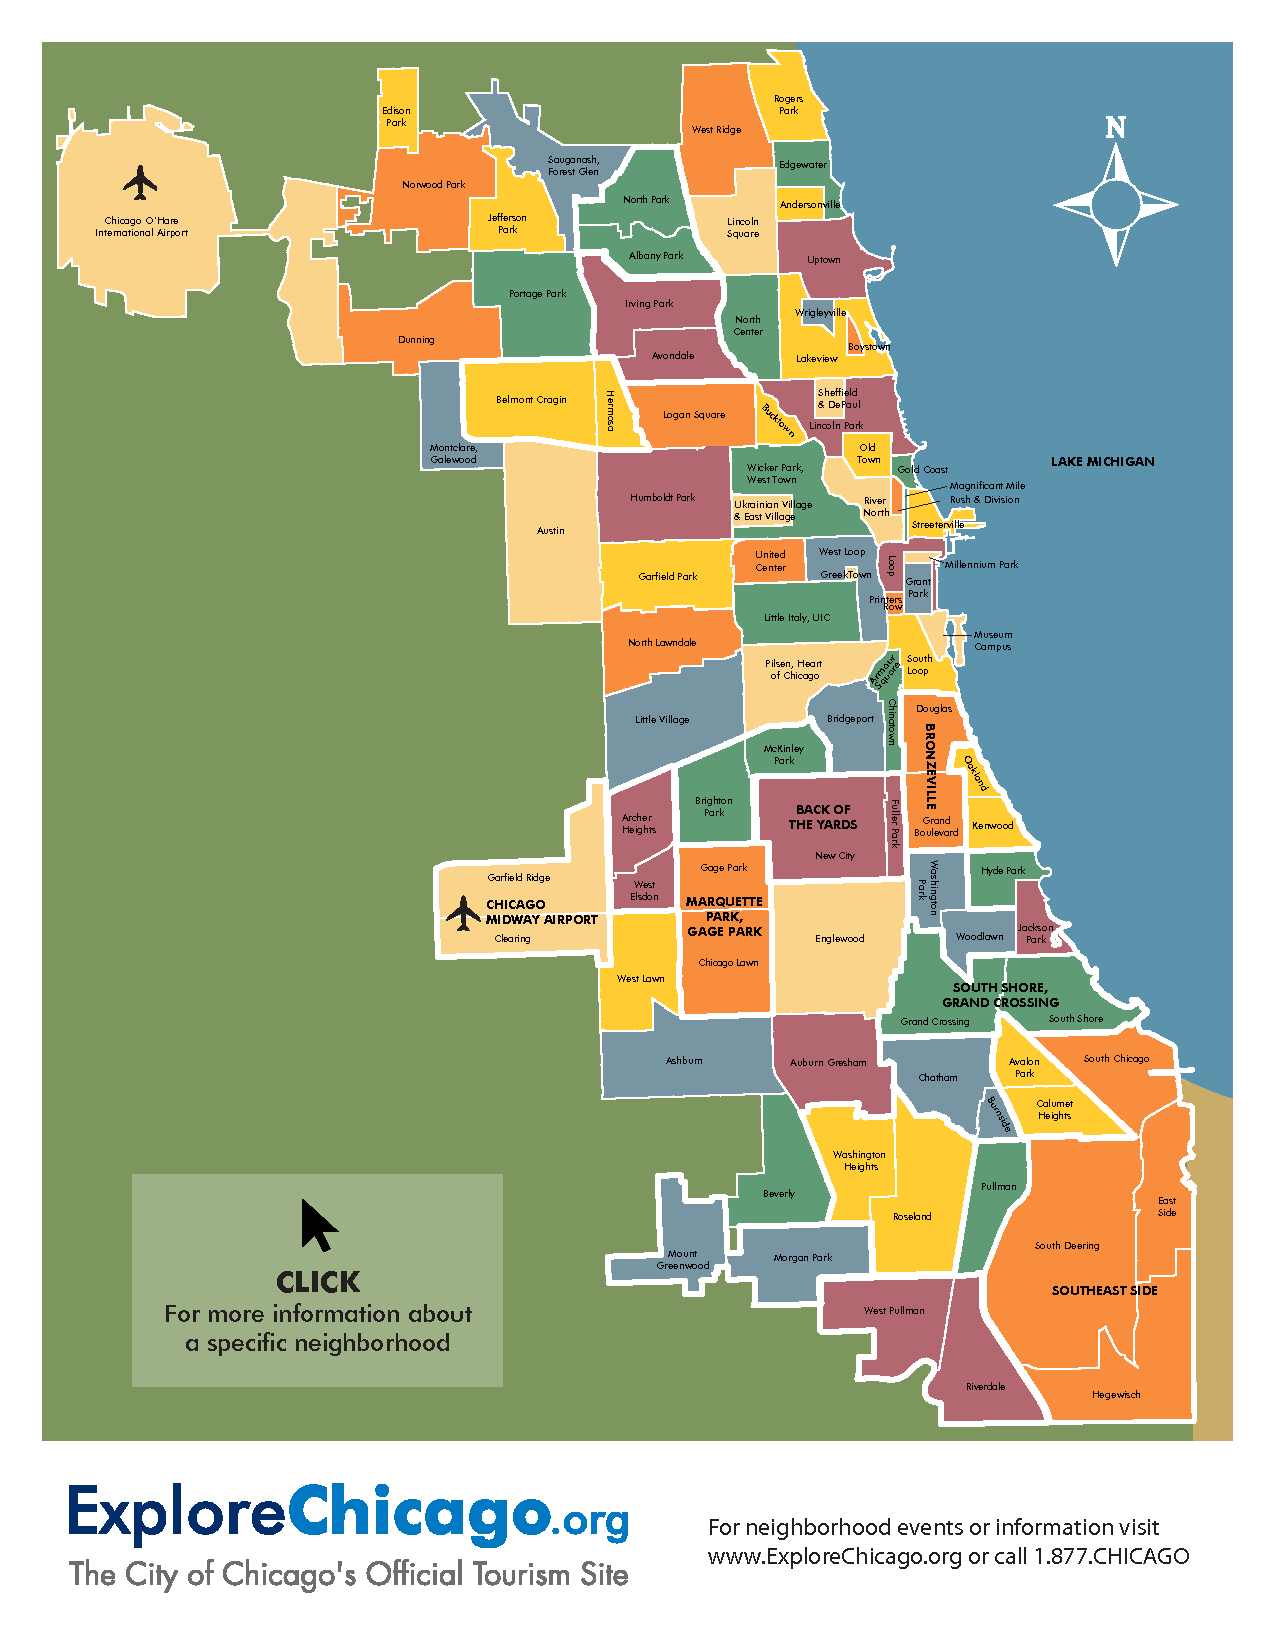 Pin by Fran Dertz on Chicago Chicago neighborhoods map